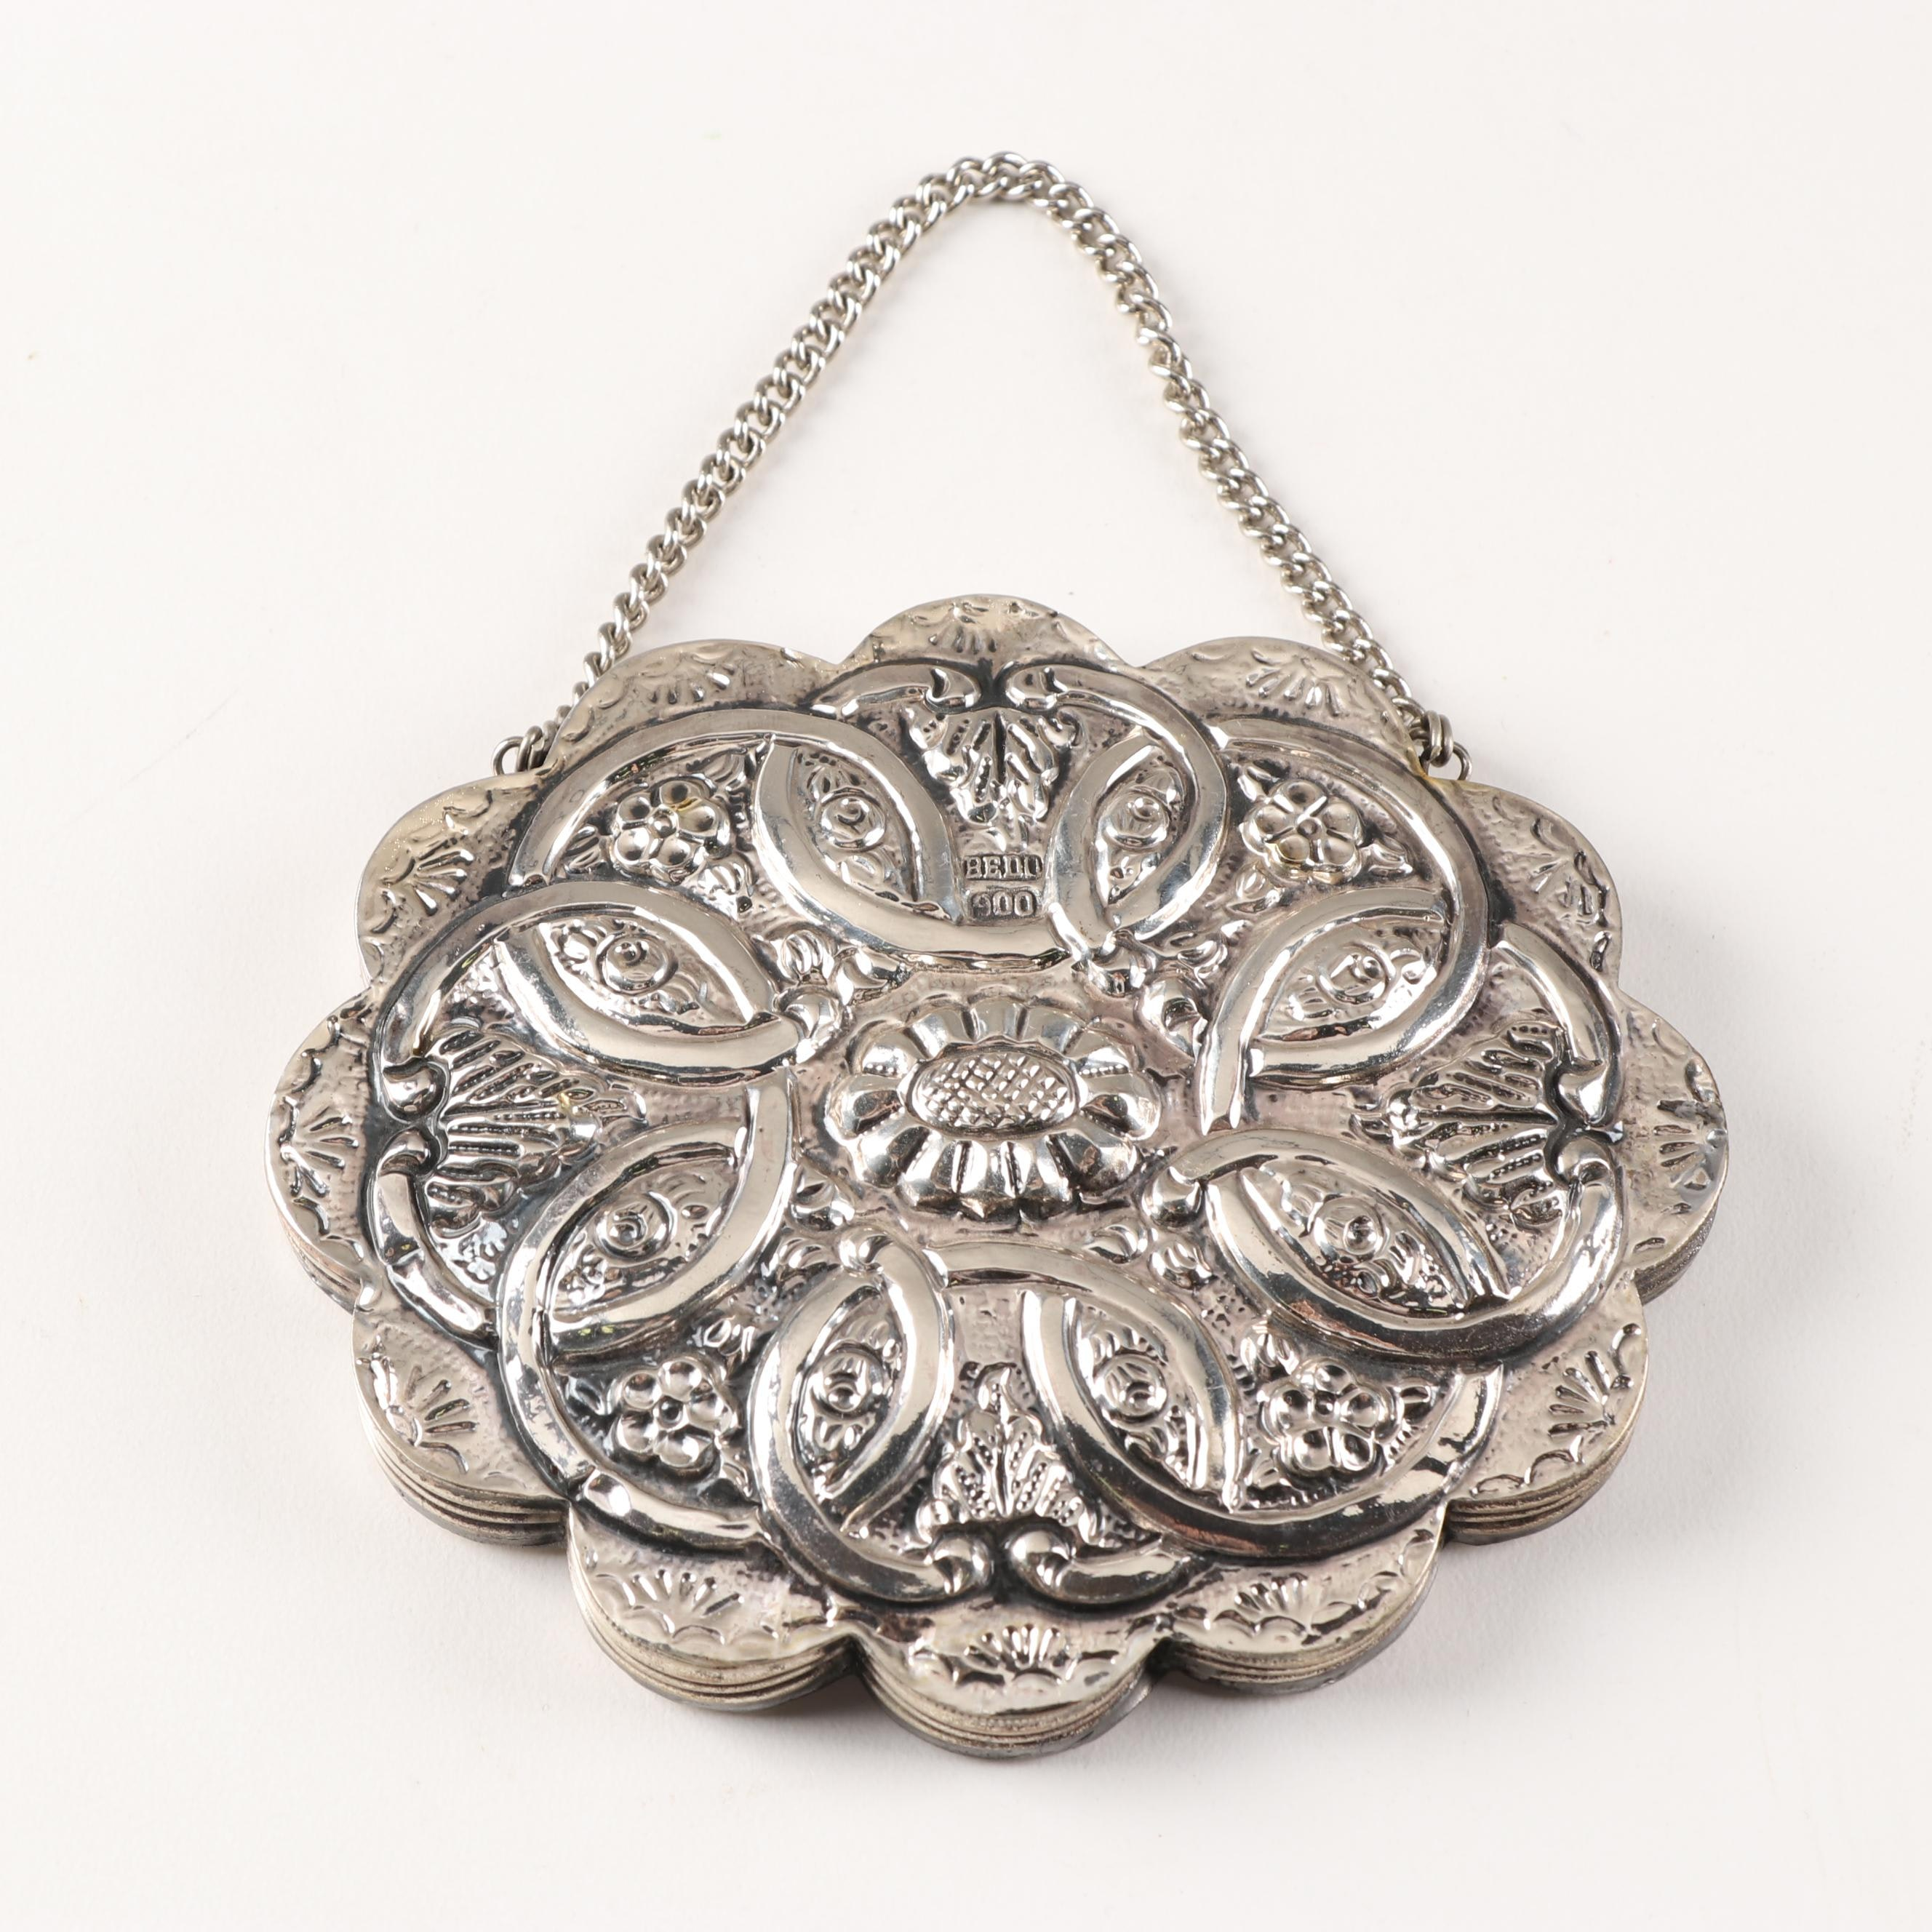 Bedo Turkish Repoussé 900 Silver Compact Mirror